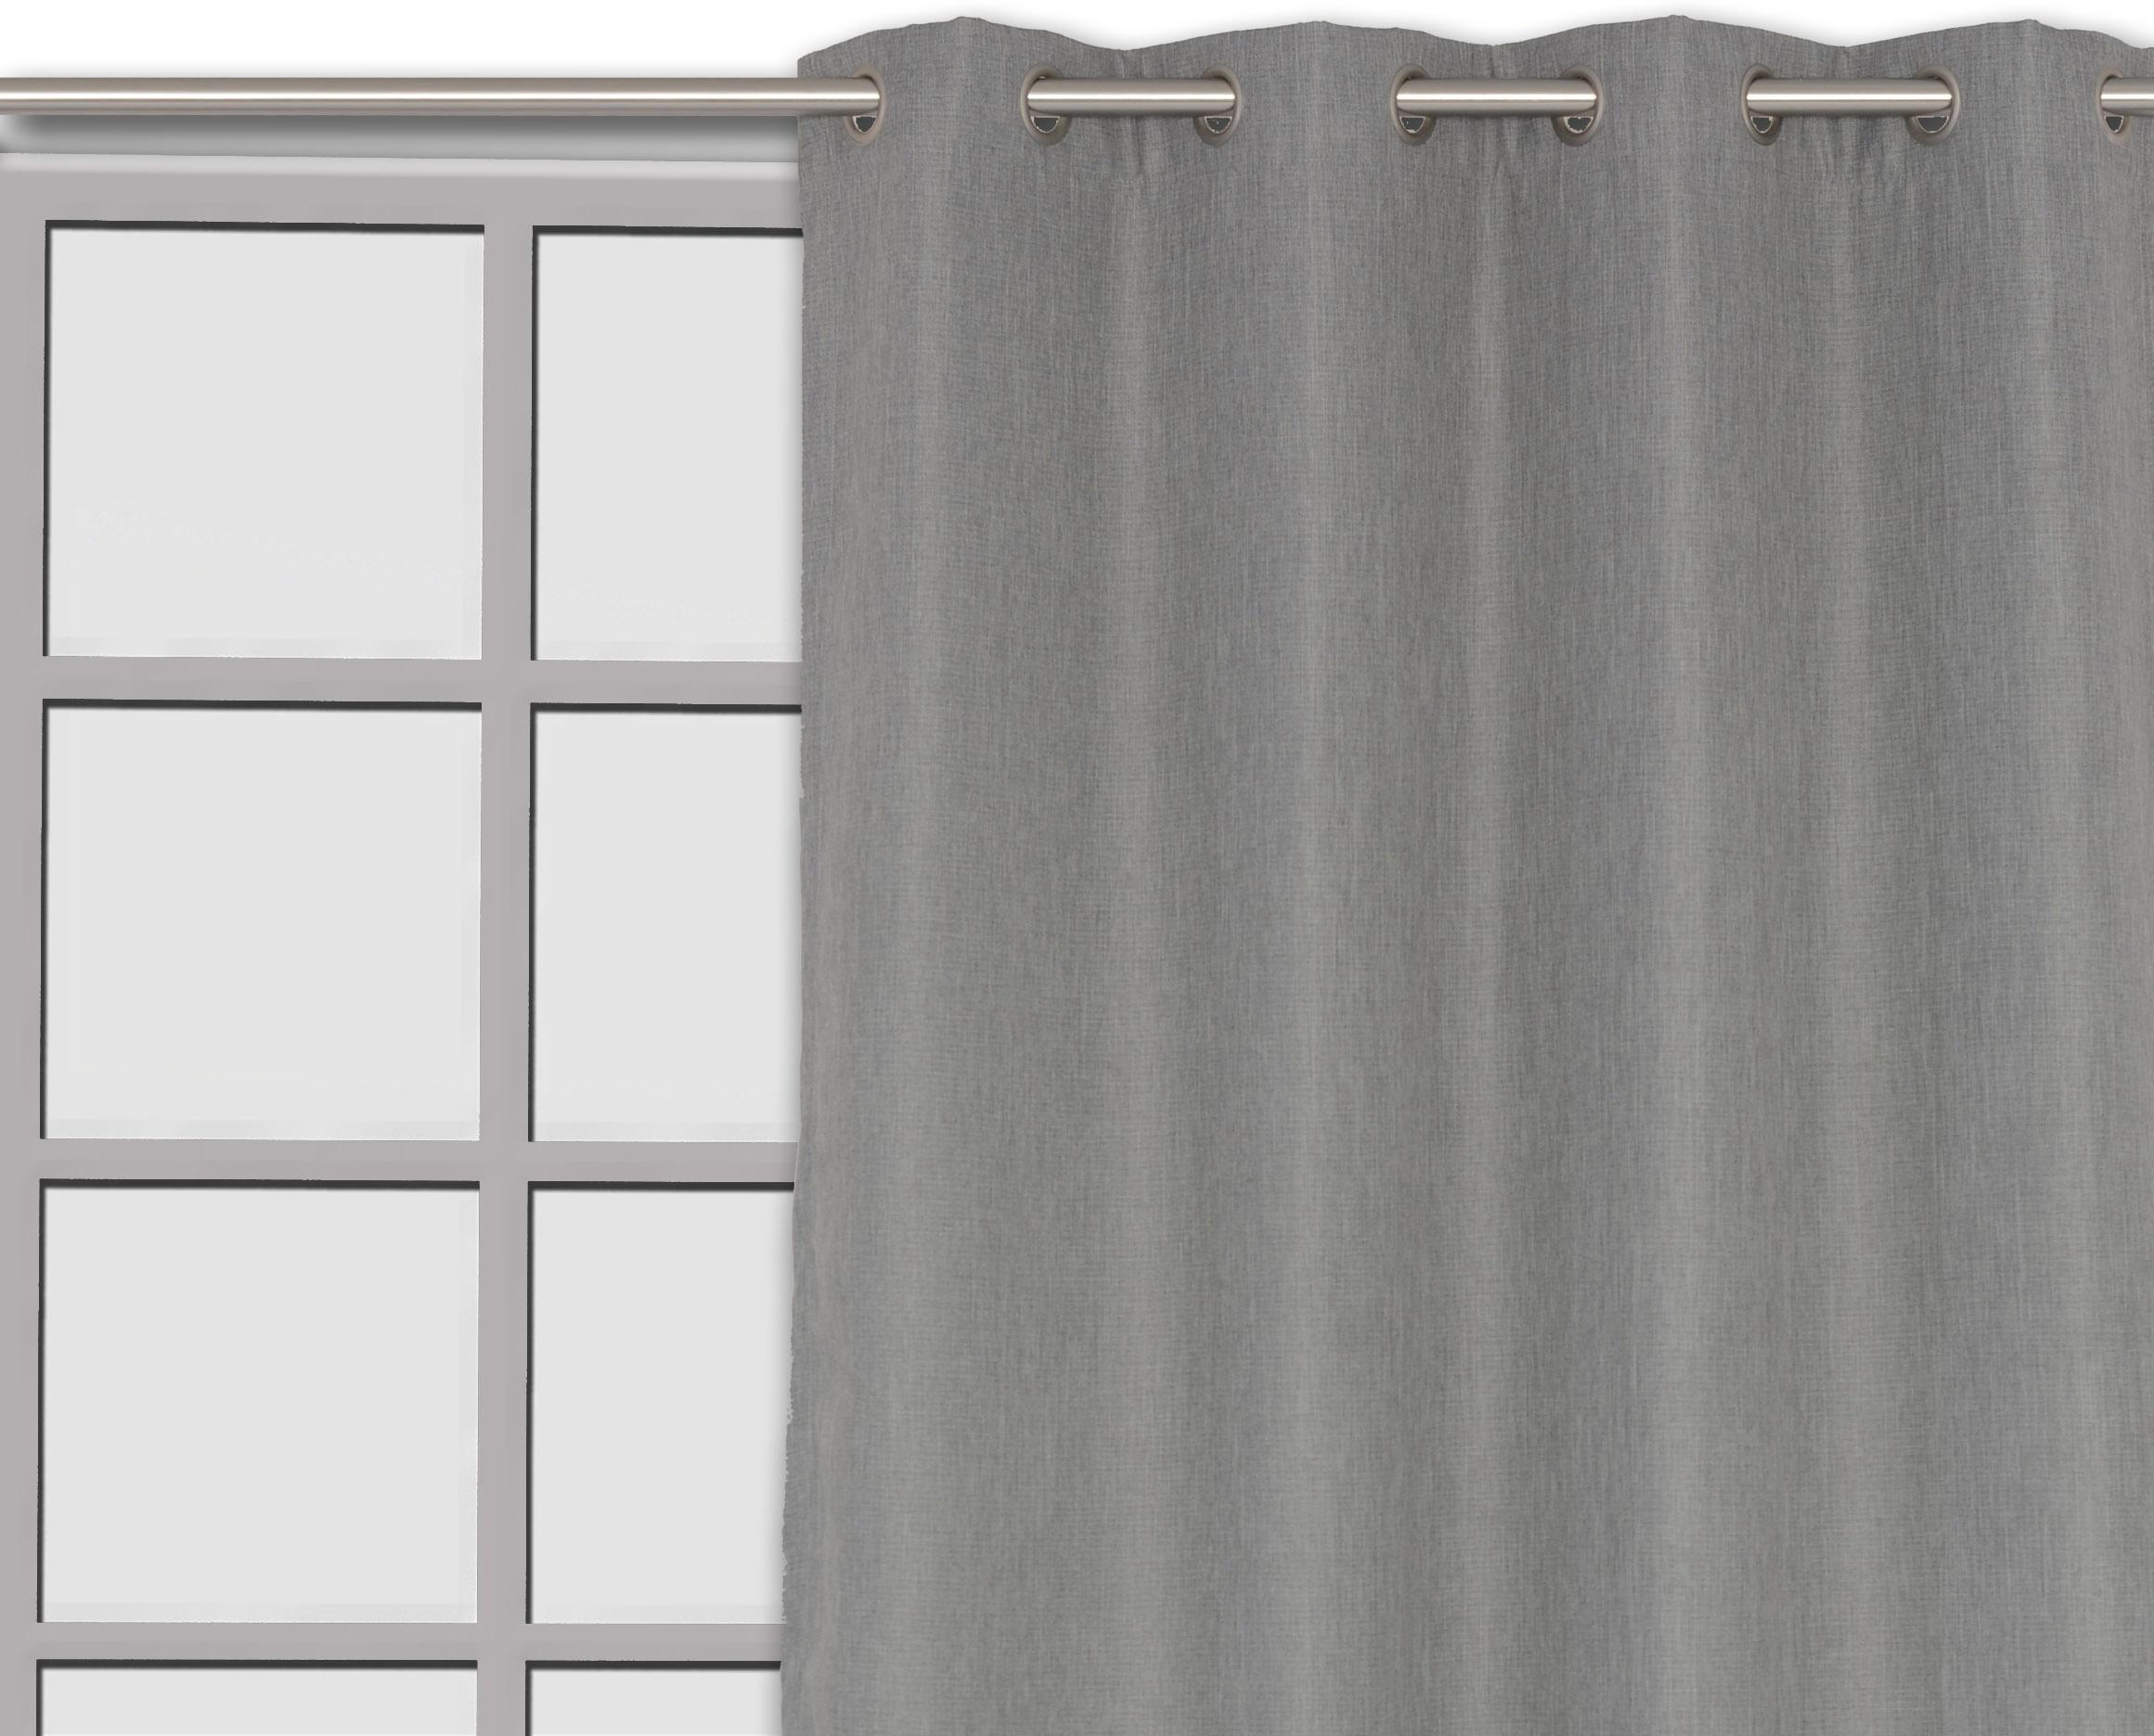 LINDOR Aargent / Silver